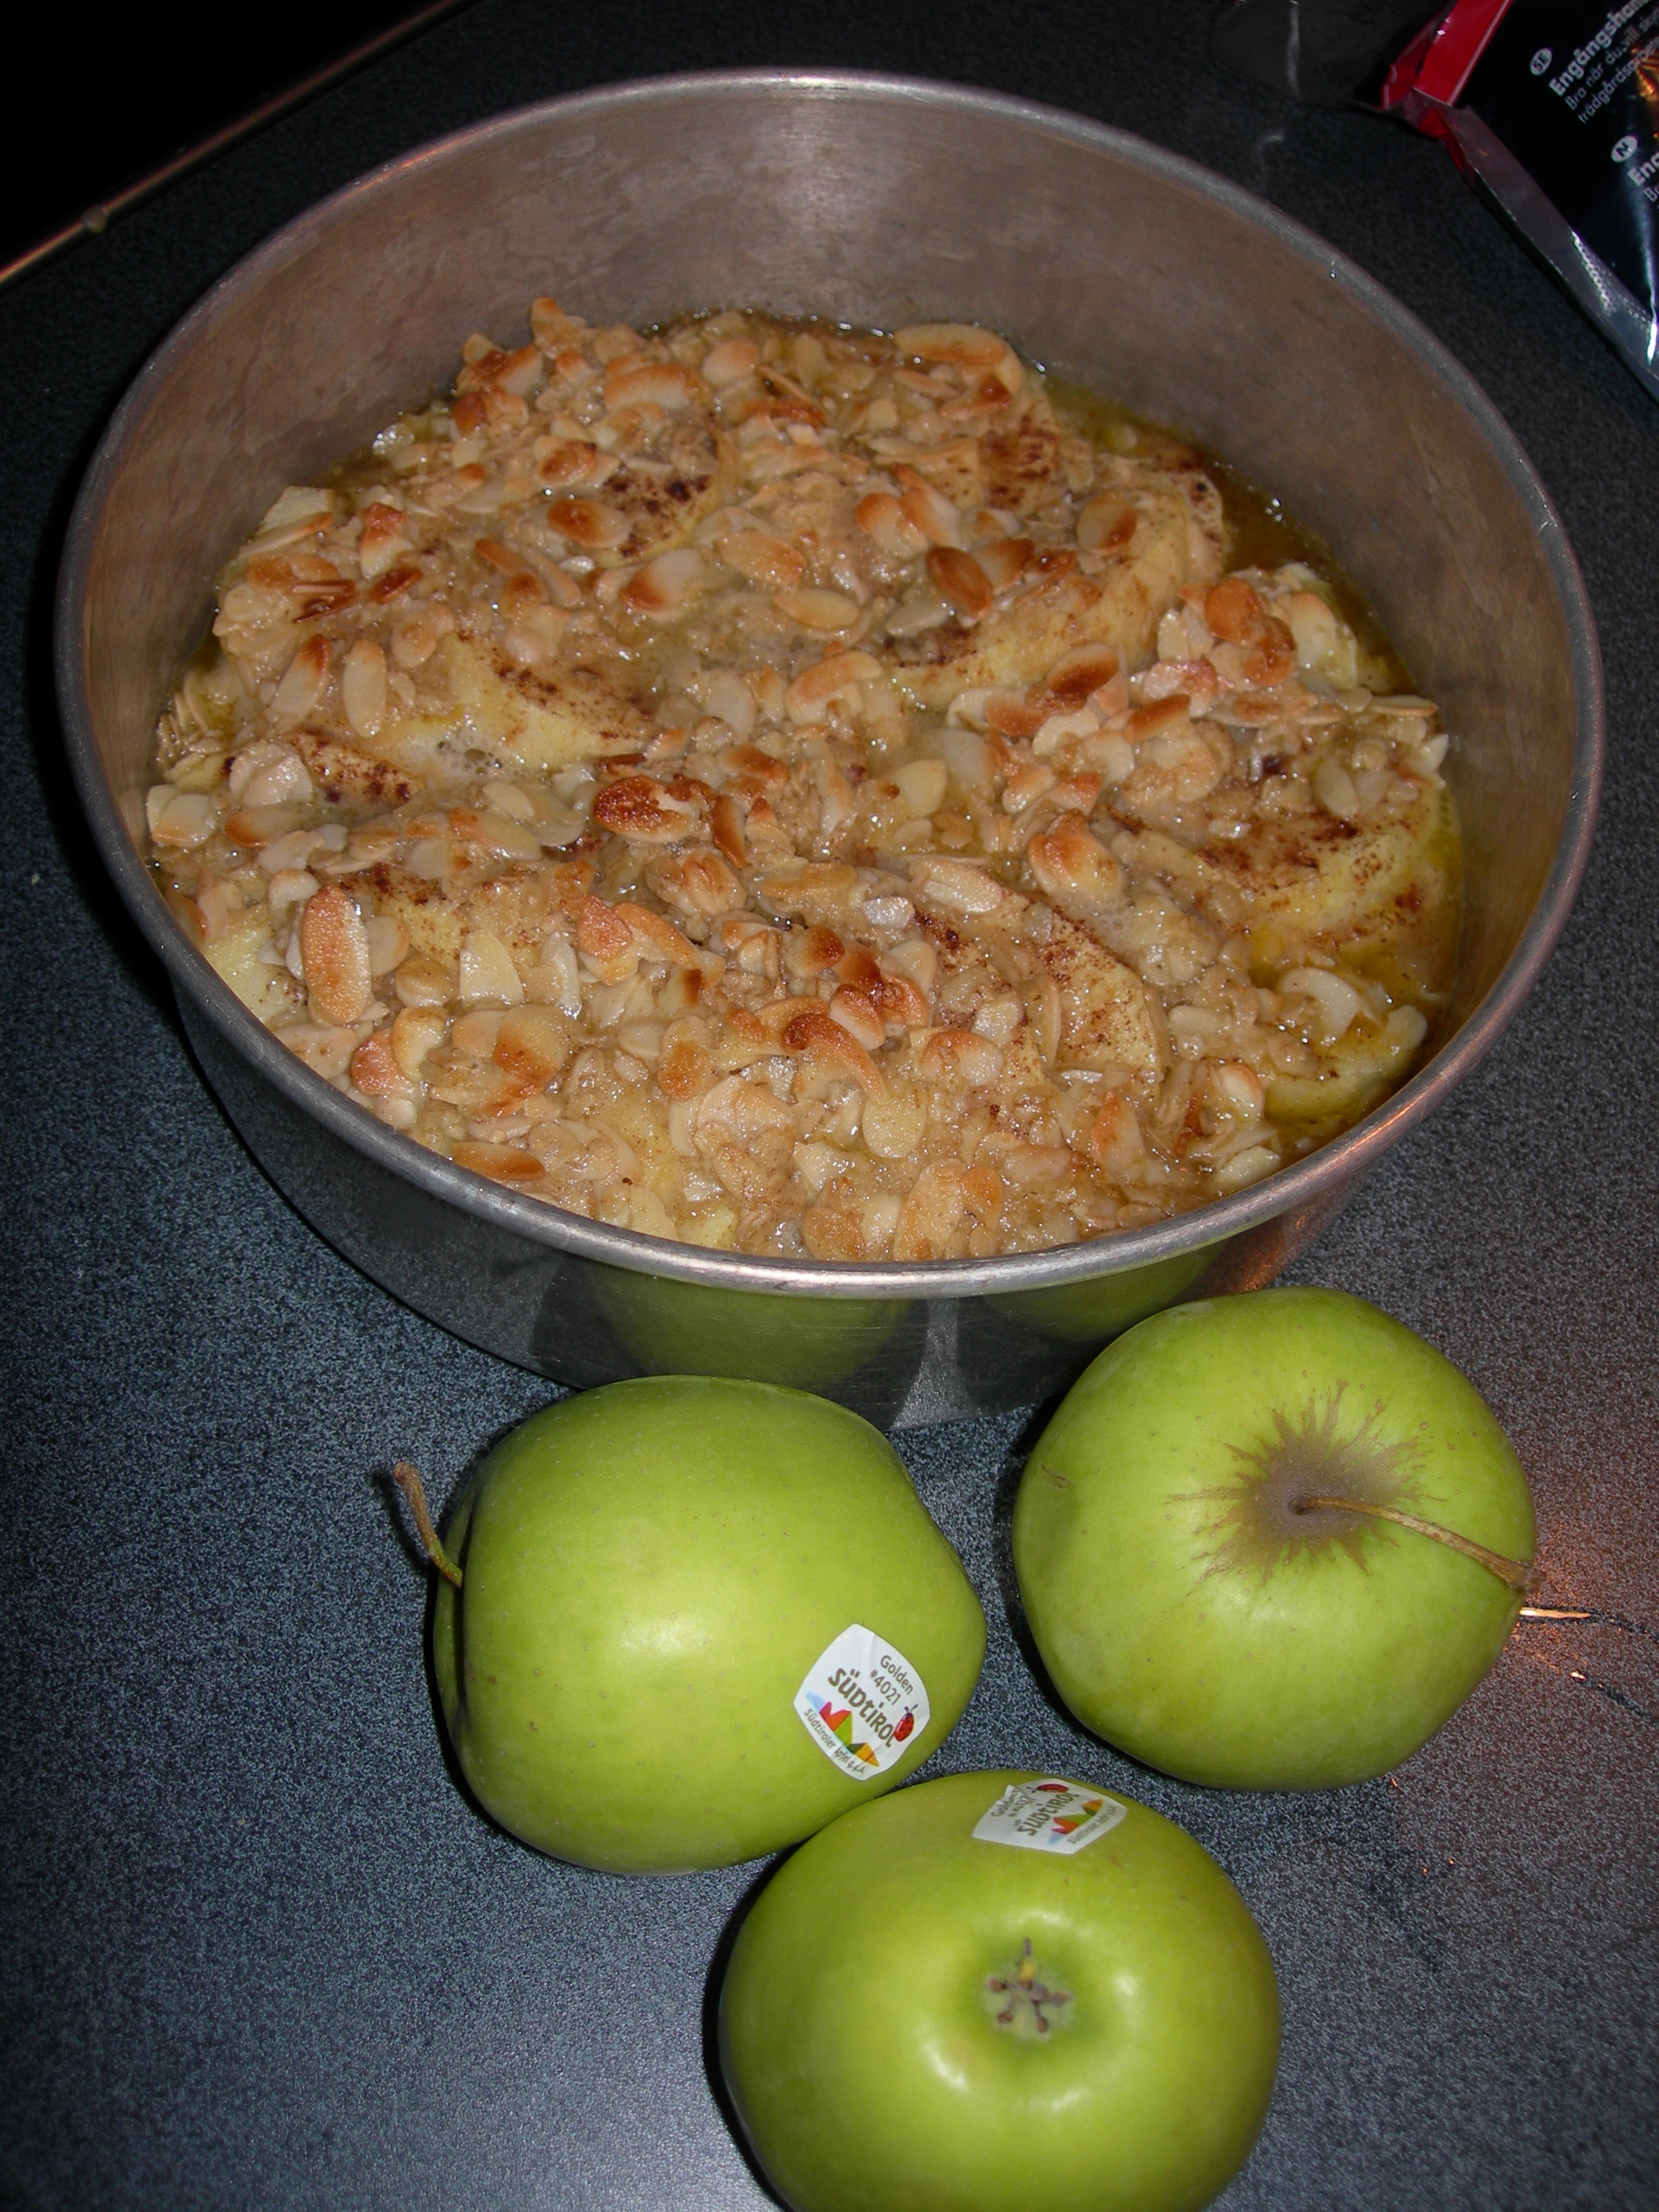 toscaäpplen i ugn